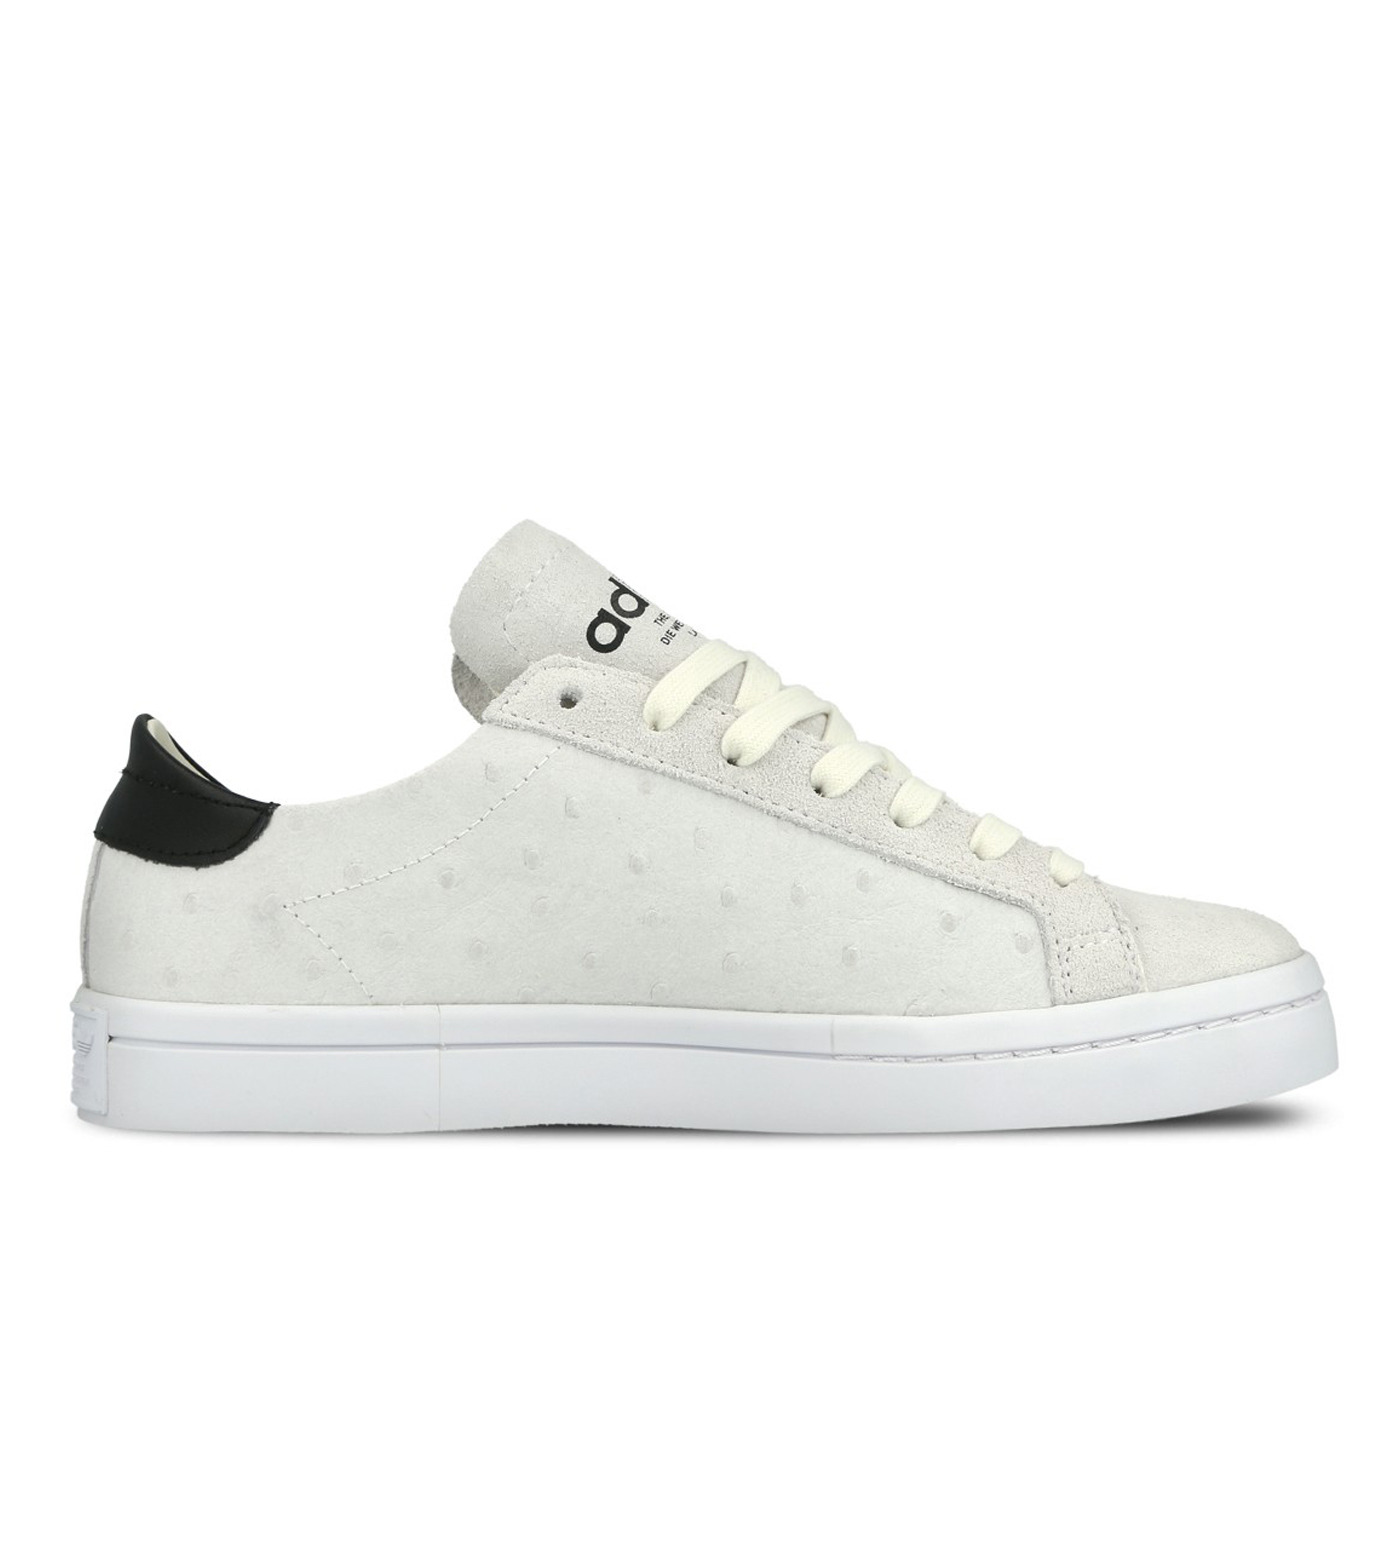 adidas(アディダス)のCourtVantage W-WHITE(シューズ/shoes)-S78887-4 拡大詳細画像1